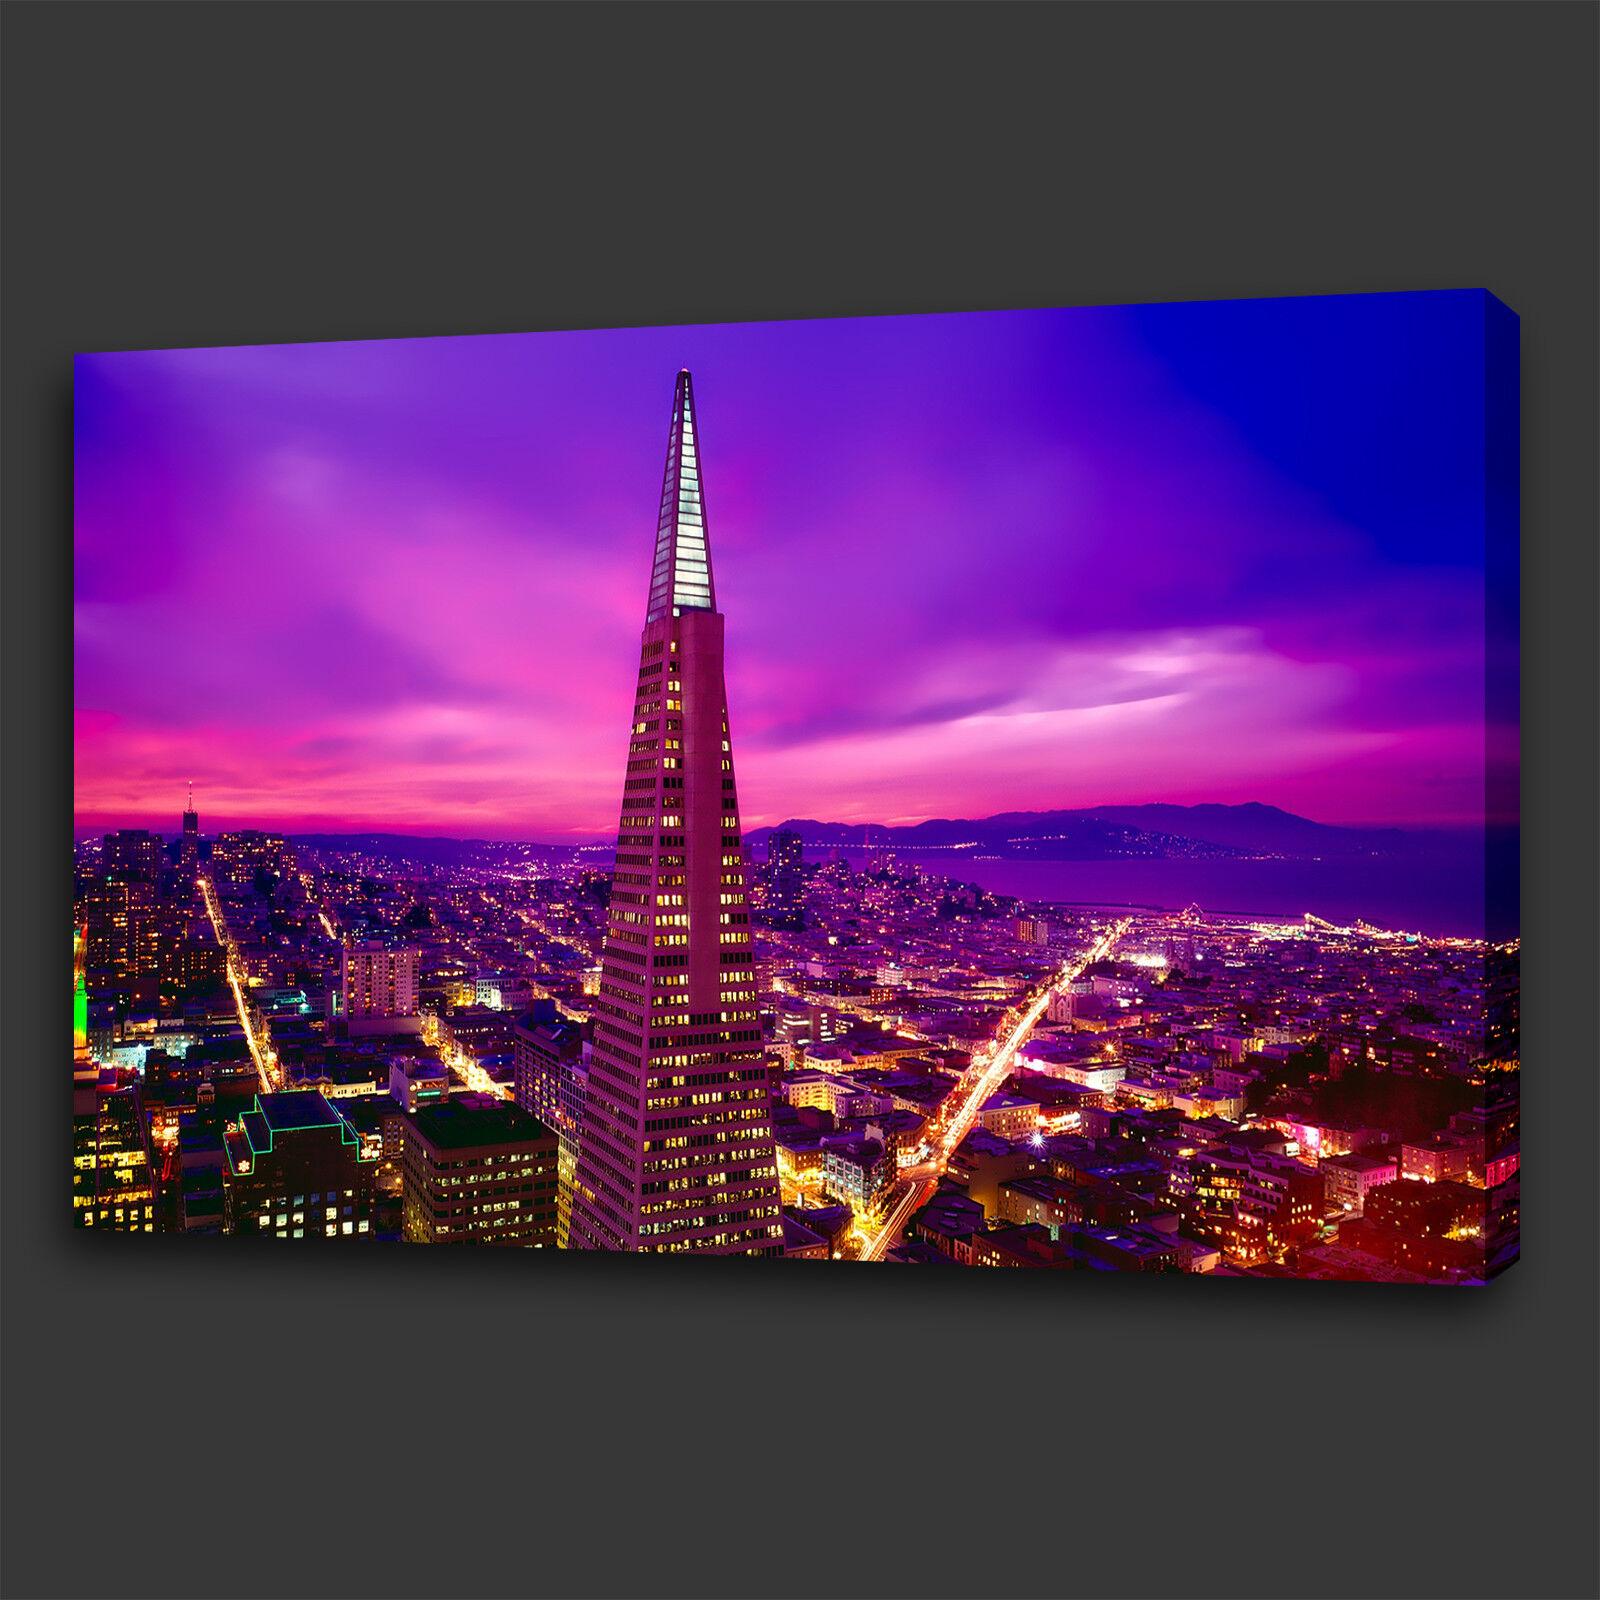 TRANSAMERICA PYRAMID SAN FRANCISCO BOX BOX BOX CANVAS PRINT WALL ART PICTURE PHOTO 55eb8c